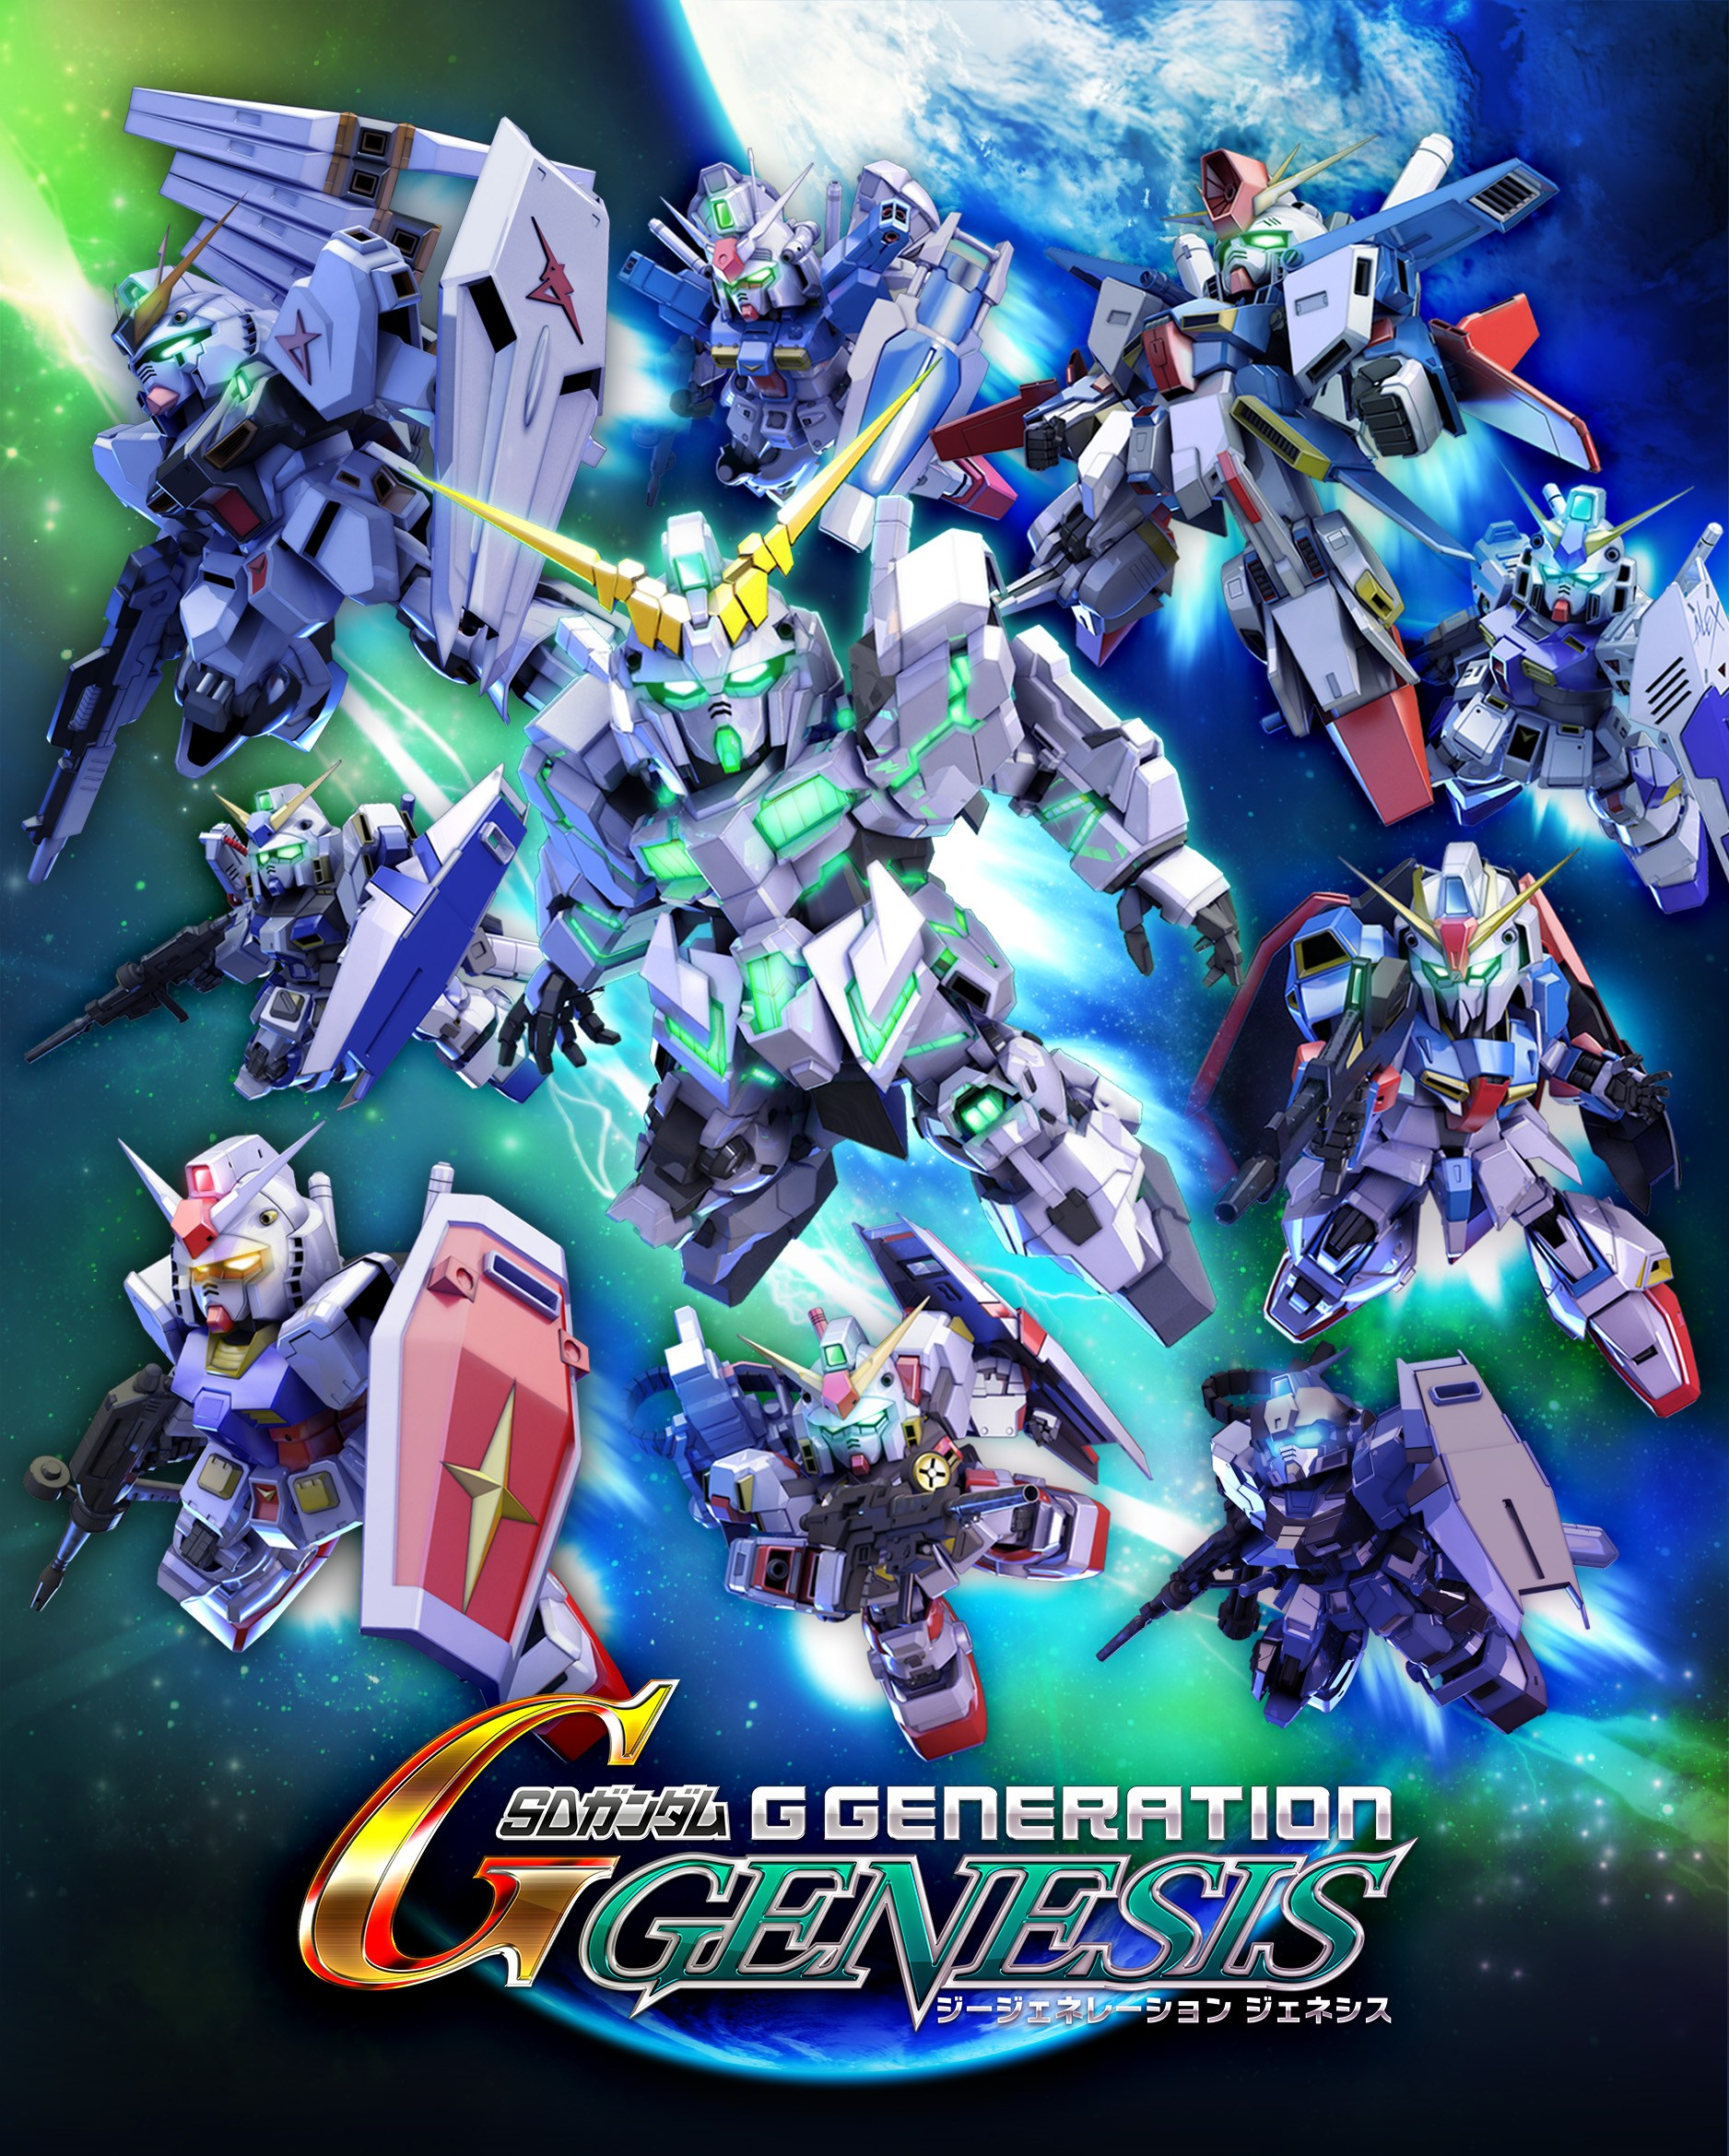 Bandai Namco anuncia SD Gundam G Generation Genesis para o Nintendo Switch